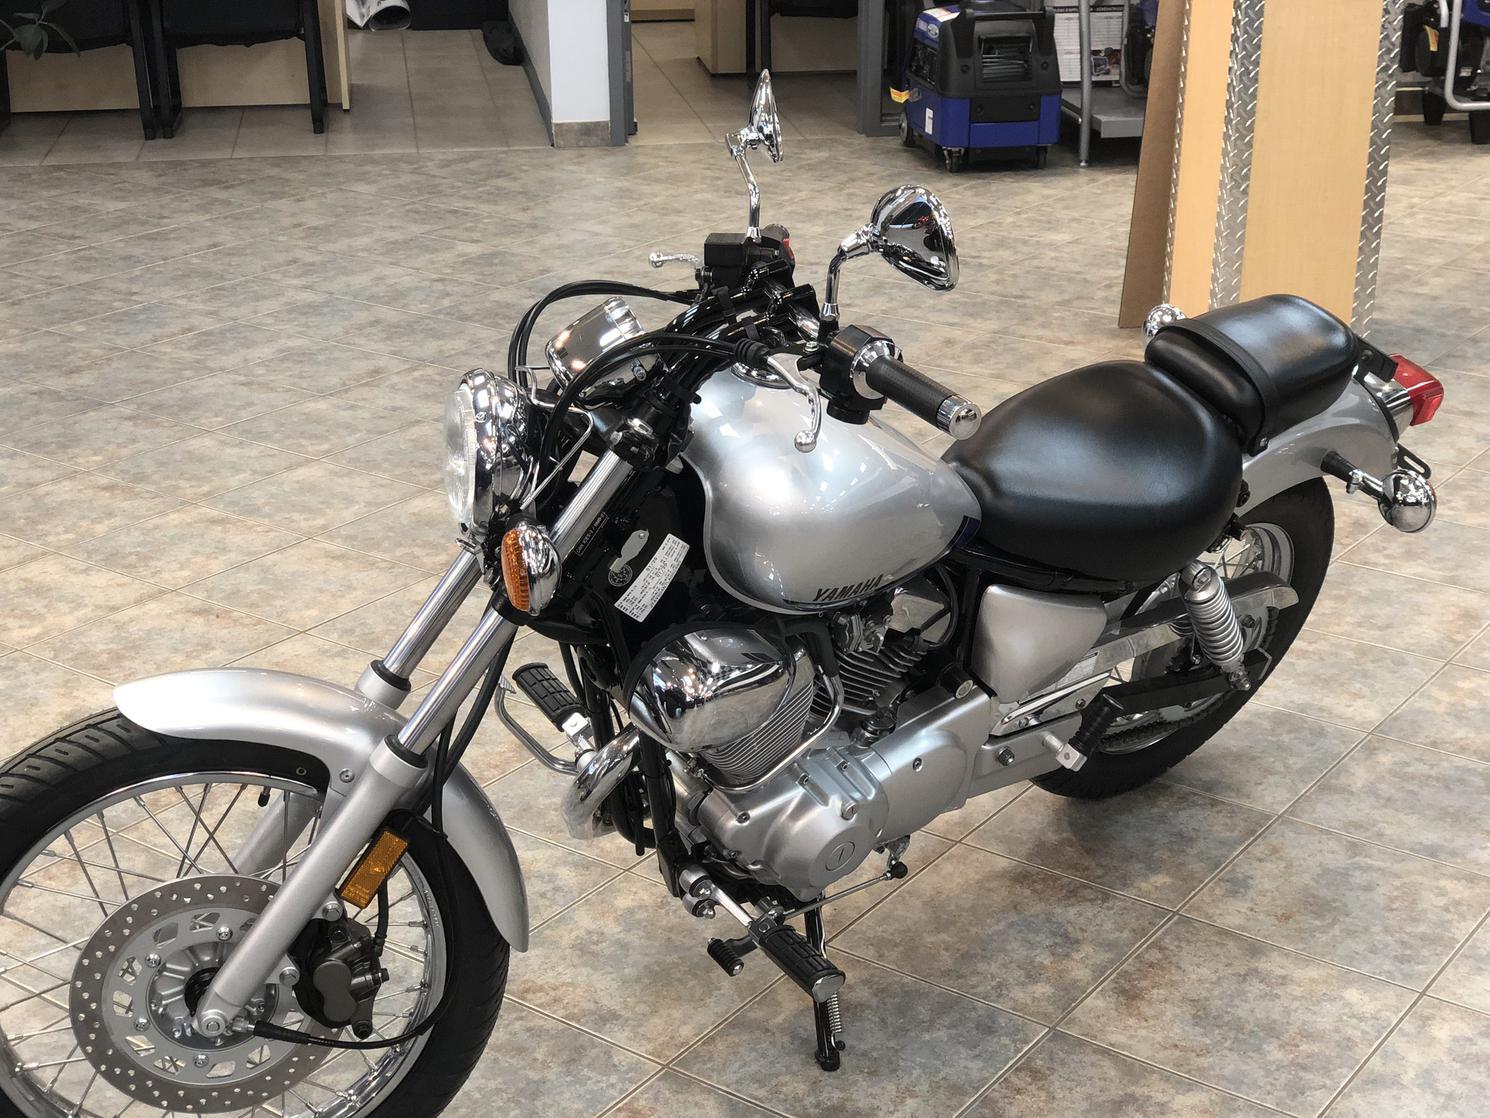 Yamaha V-STAR 250 2021 - V-STAR 250